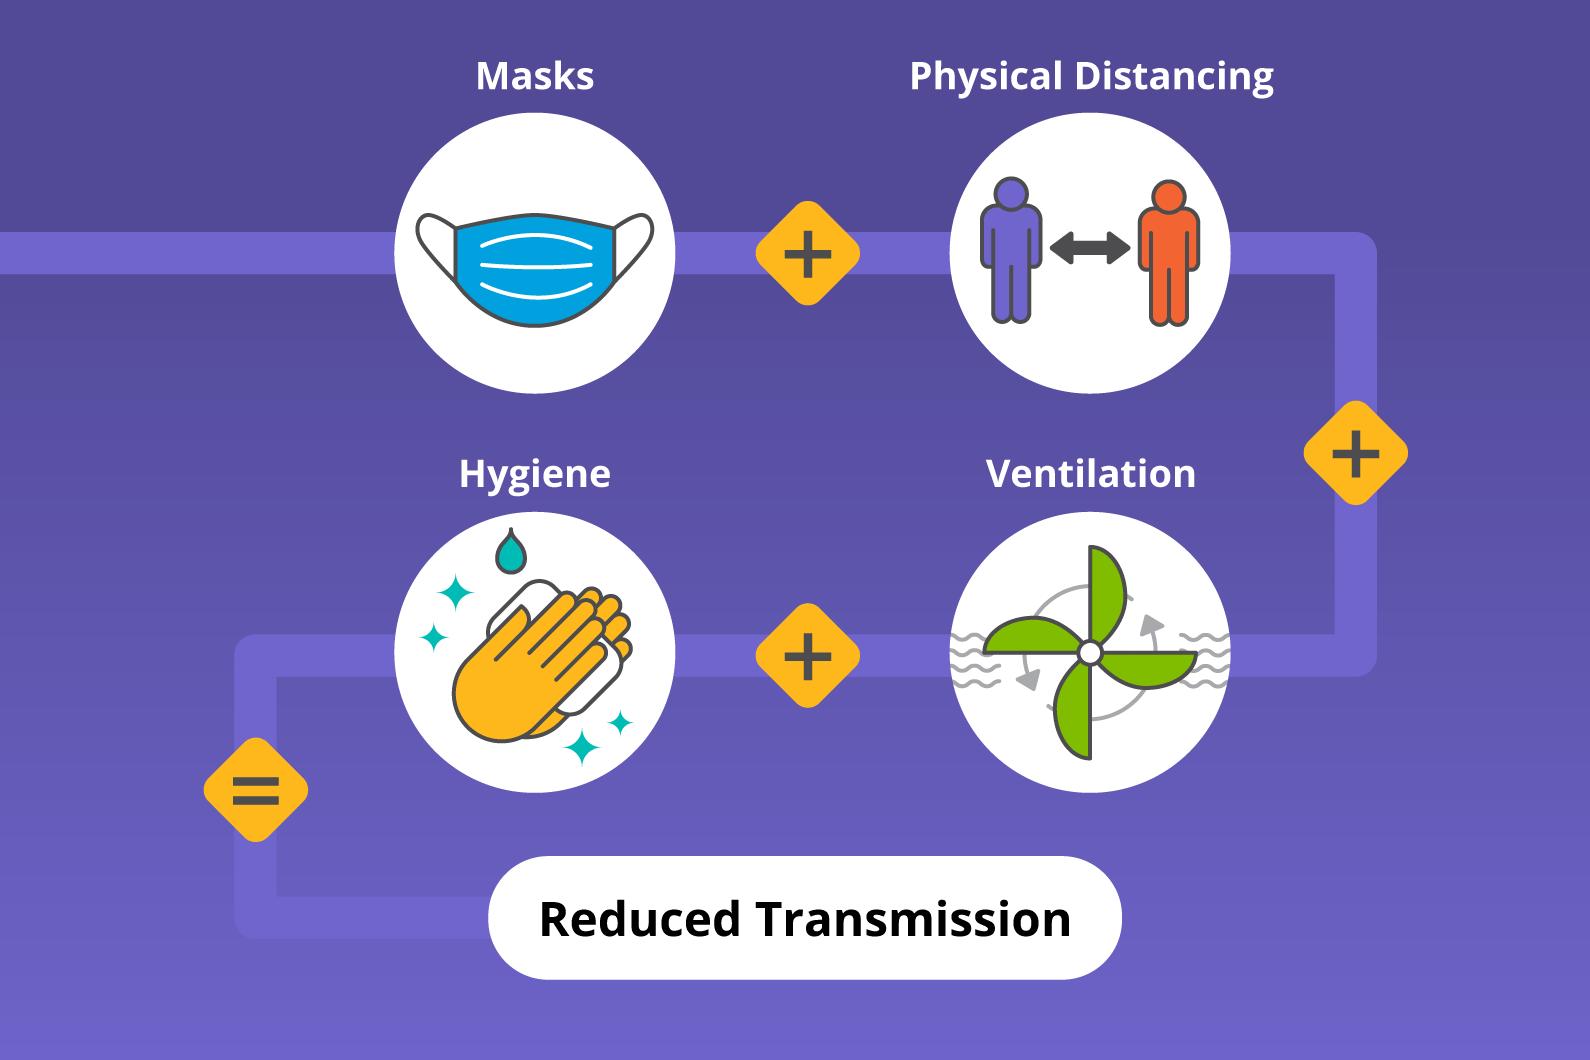 Graphic Reduce transmission masks, physical distancing , ventilation, hygiene